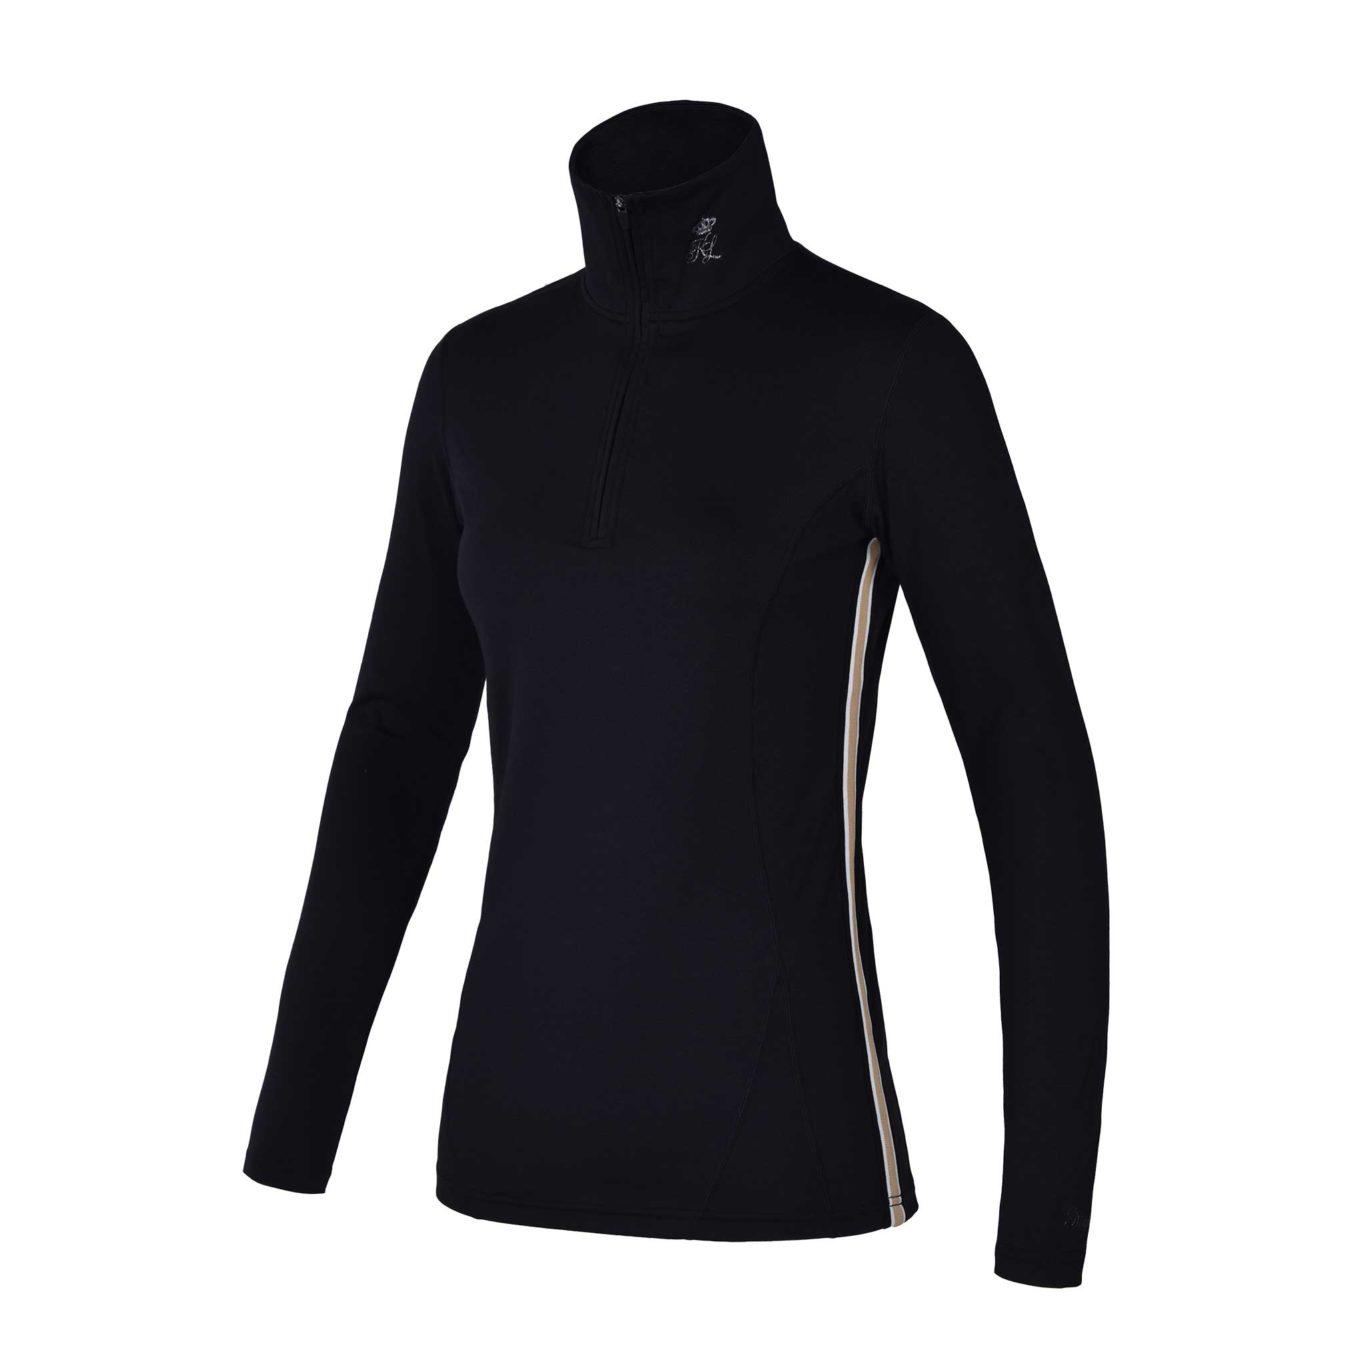 Camiseta de entrenamiento negra para mujer modelo Lotaki de Kingsland